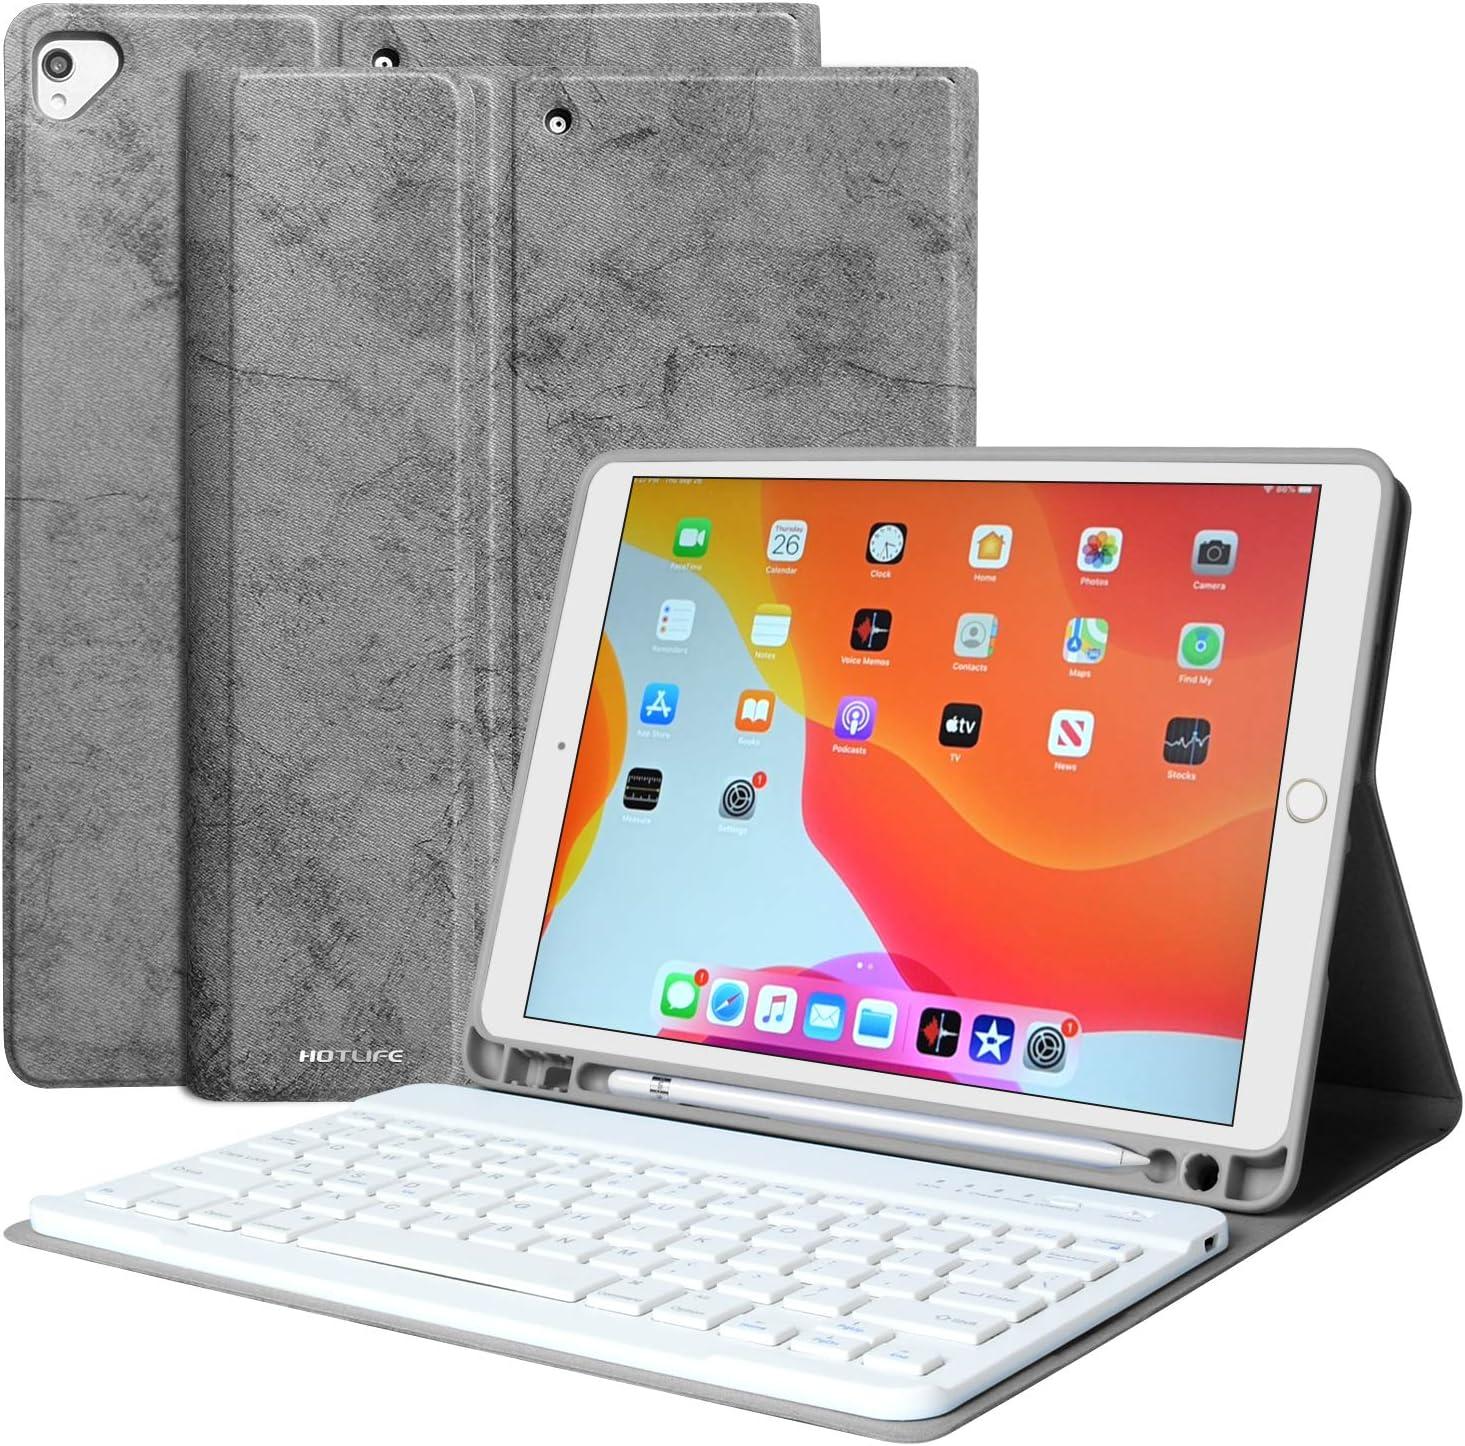 iPad Keyboard Case 10.2 8th 7th Generation 2020/2019 - Magnetic Detachable Bluetooth Keyboard for iPad 8th Gen/ 7th Gen Keyboard Case with Pencil Holder for Generation 8 Gen 7 Air 3 10.5 Pro 10.5,Grey